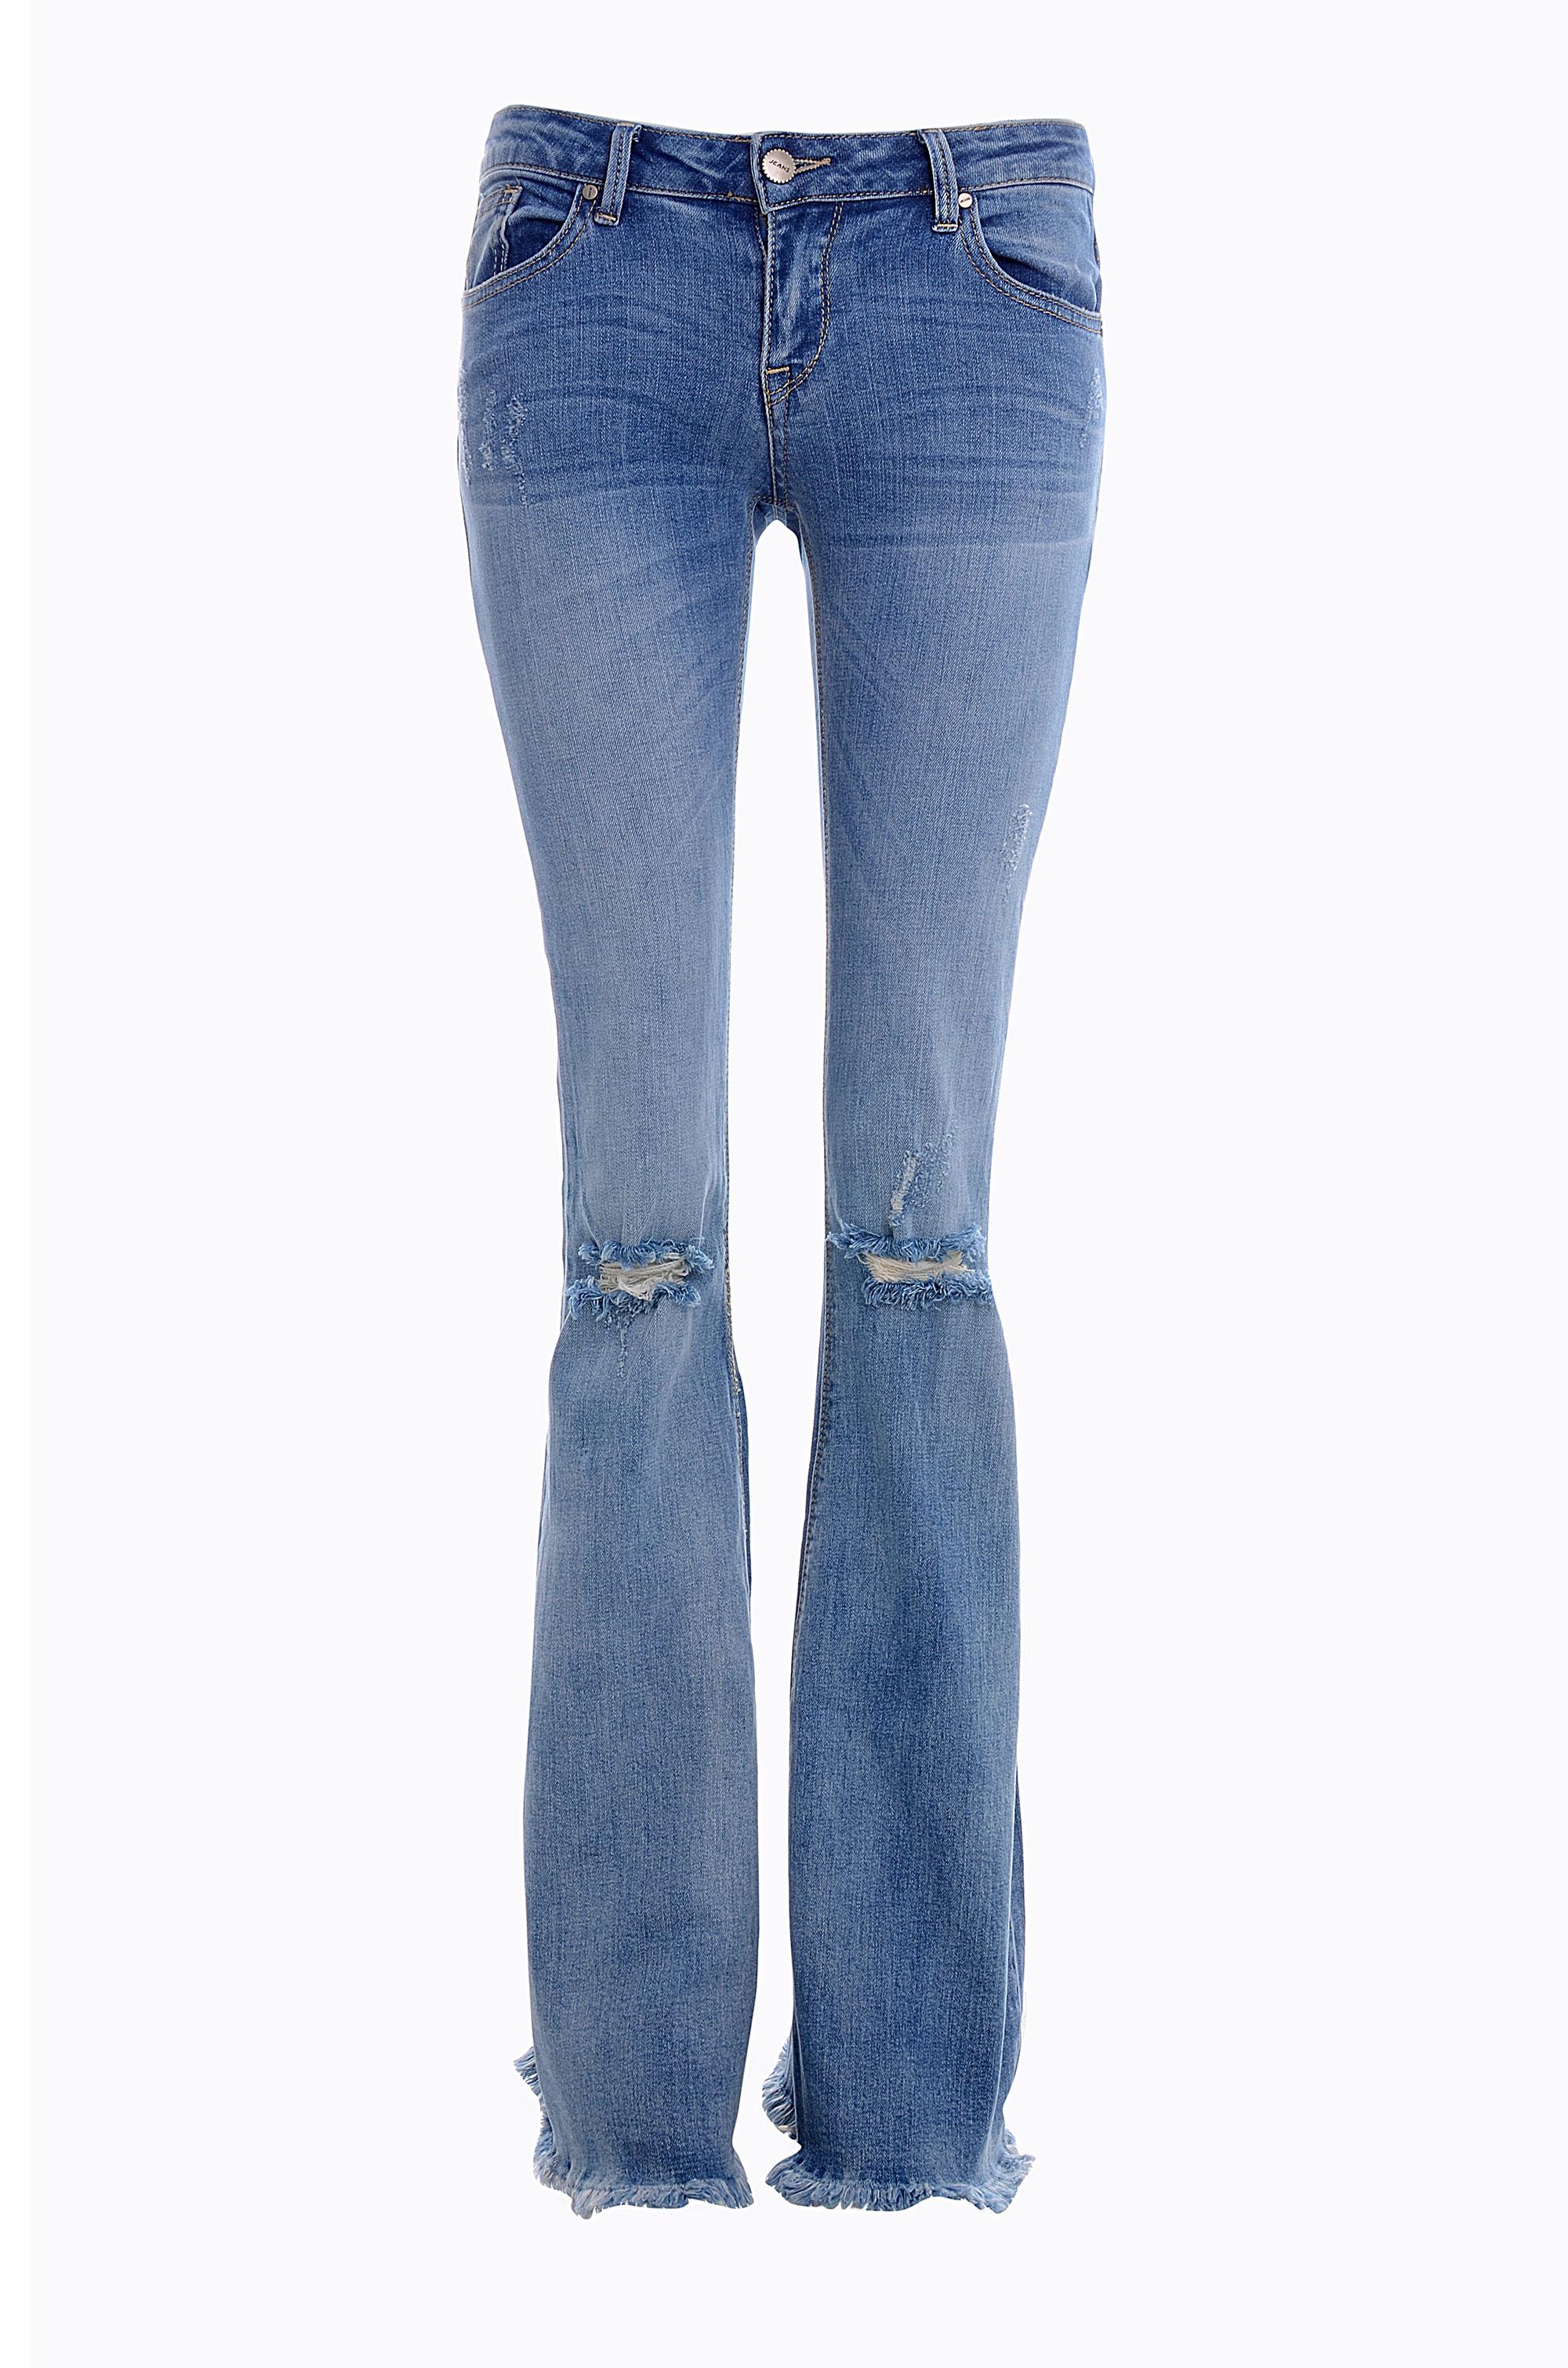 Spodnie - 92-ML1402 JEA - Unisono